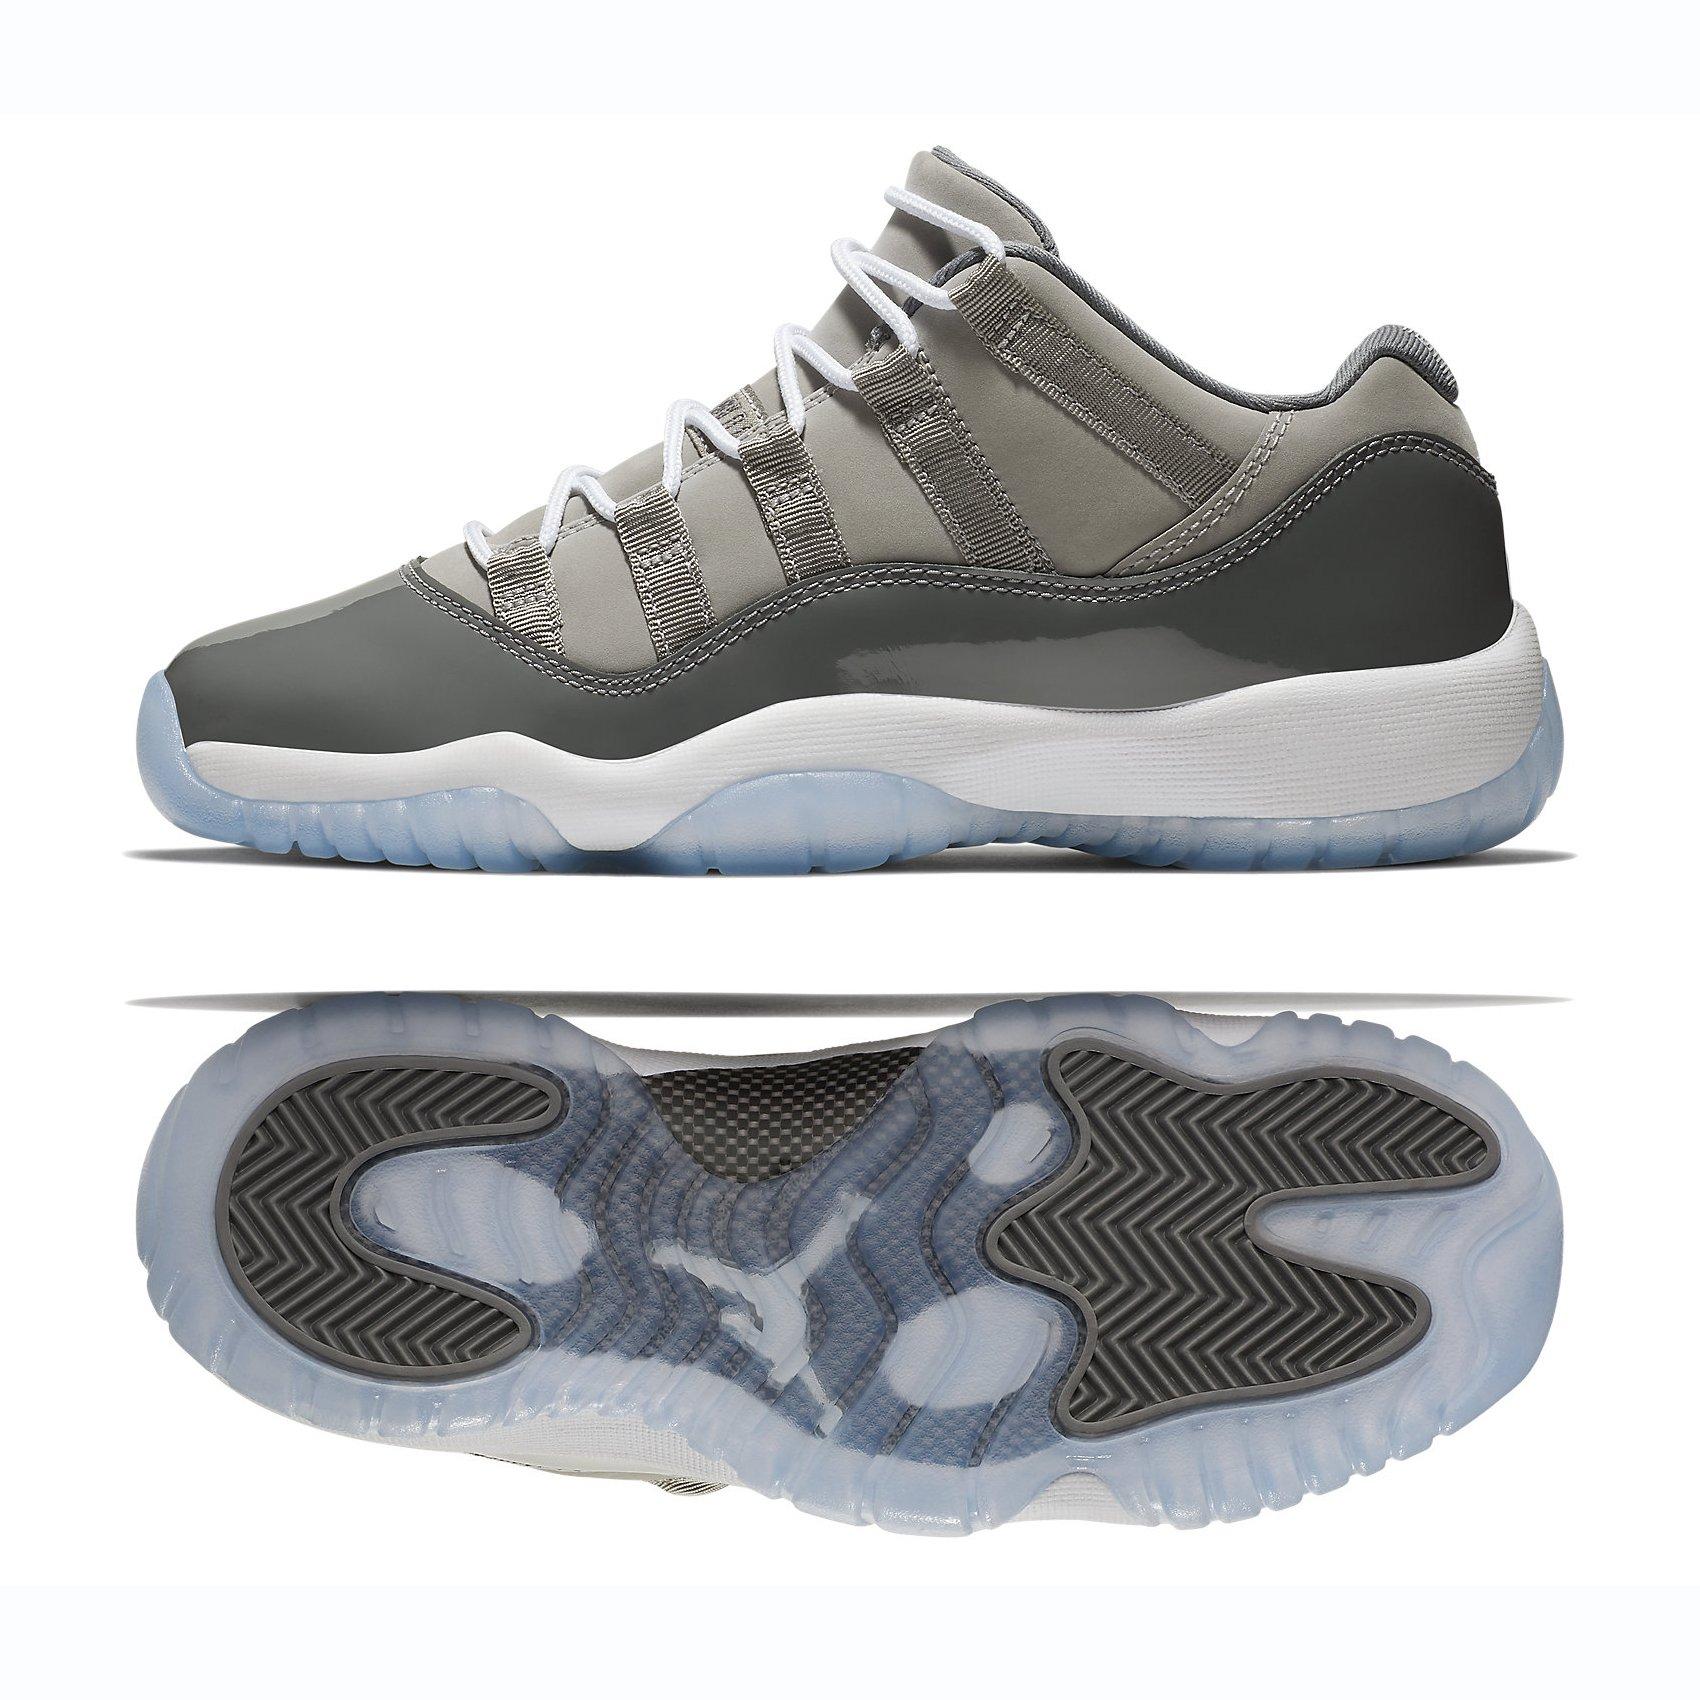 Nike Air Jordam 11 Rtero Low GS Kids Medium Grey 528896-003 (Size: 4Y)